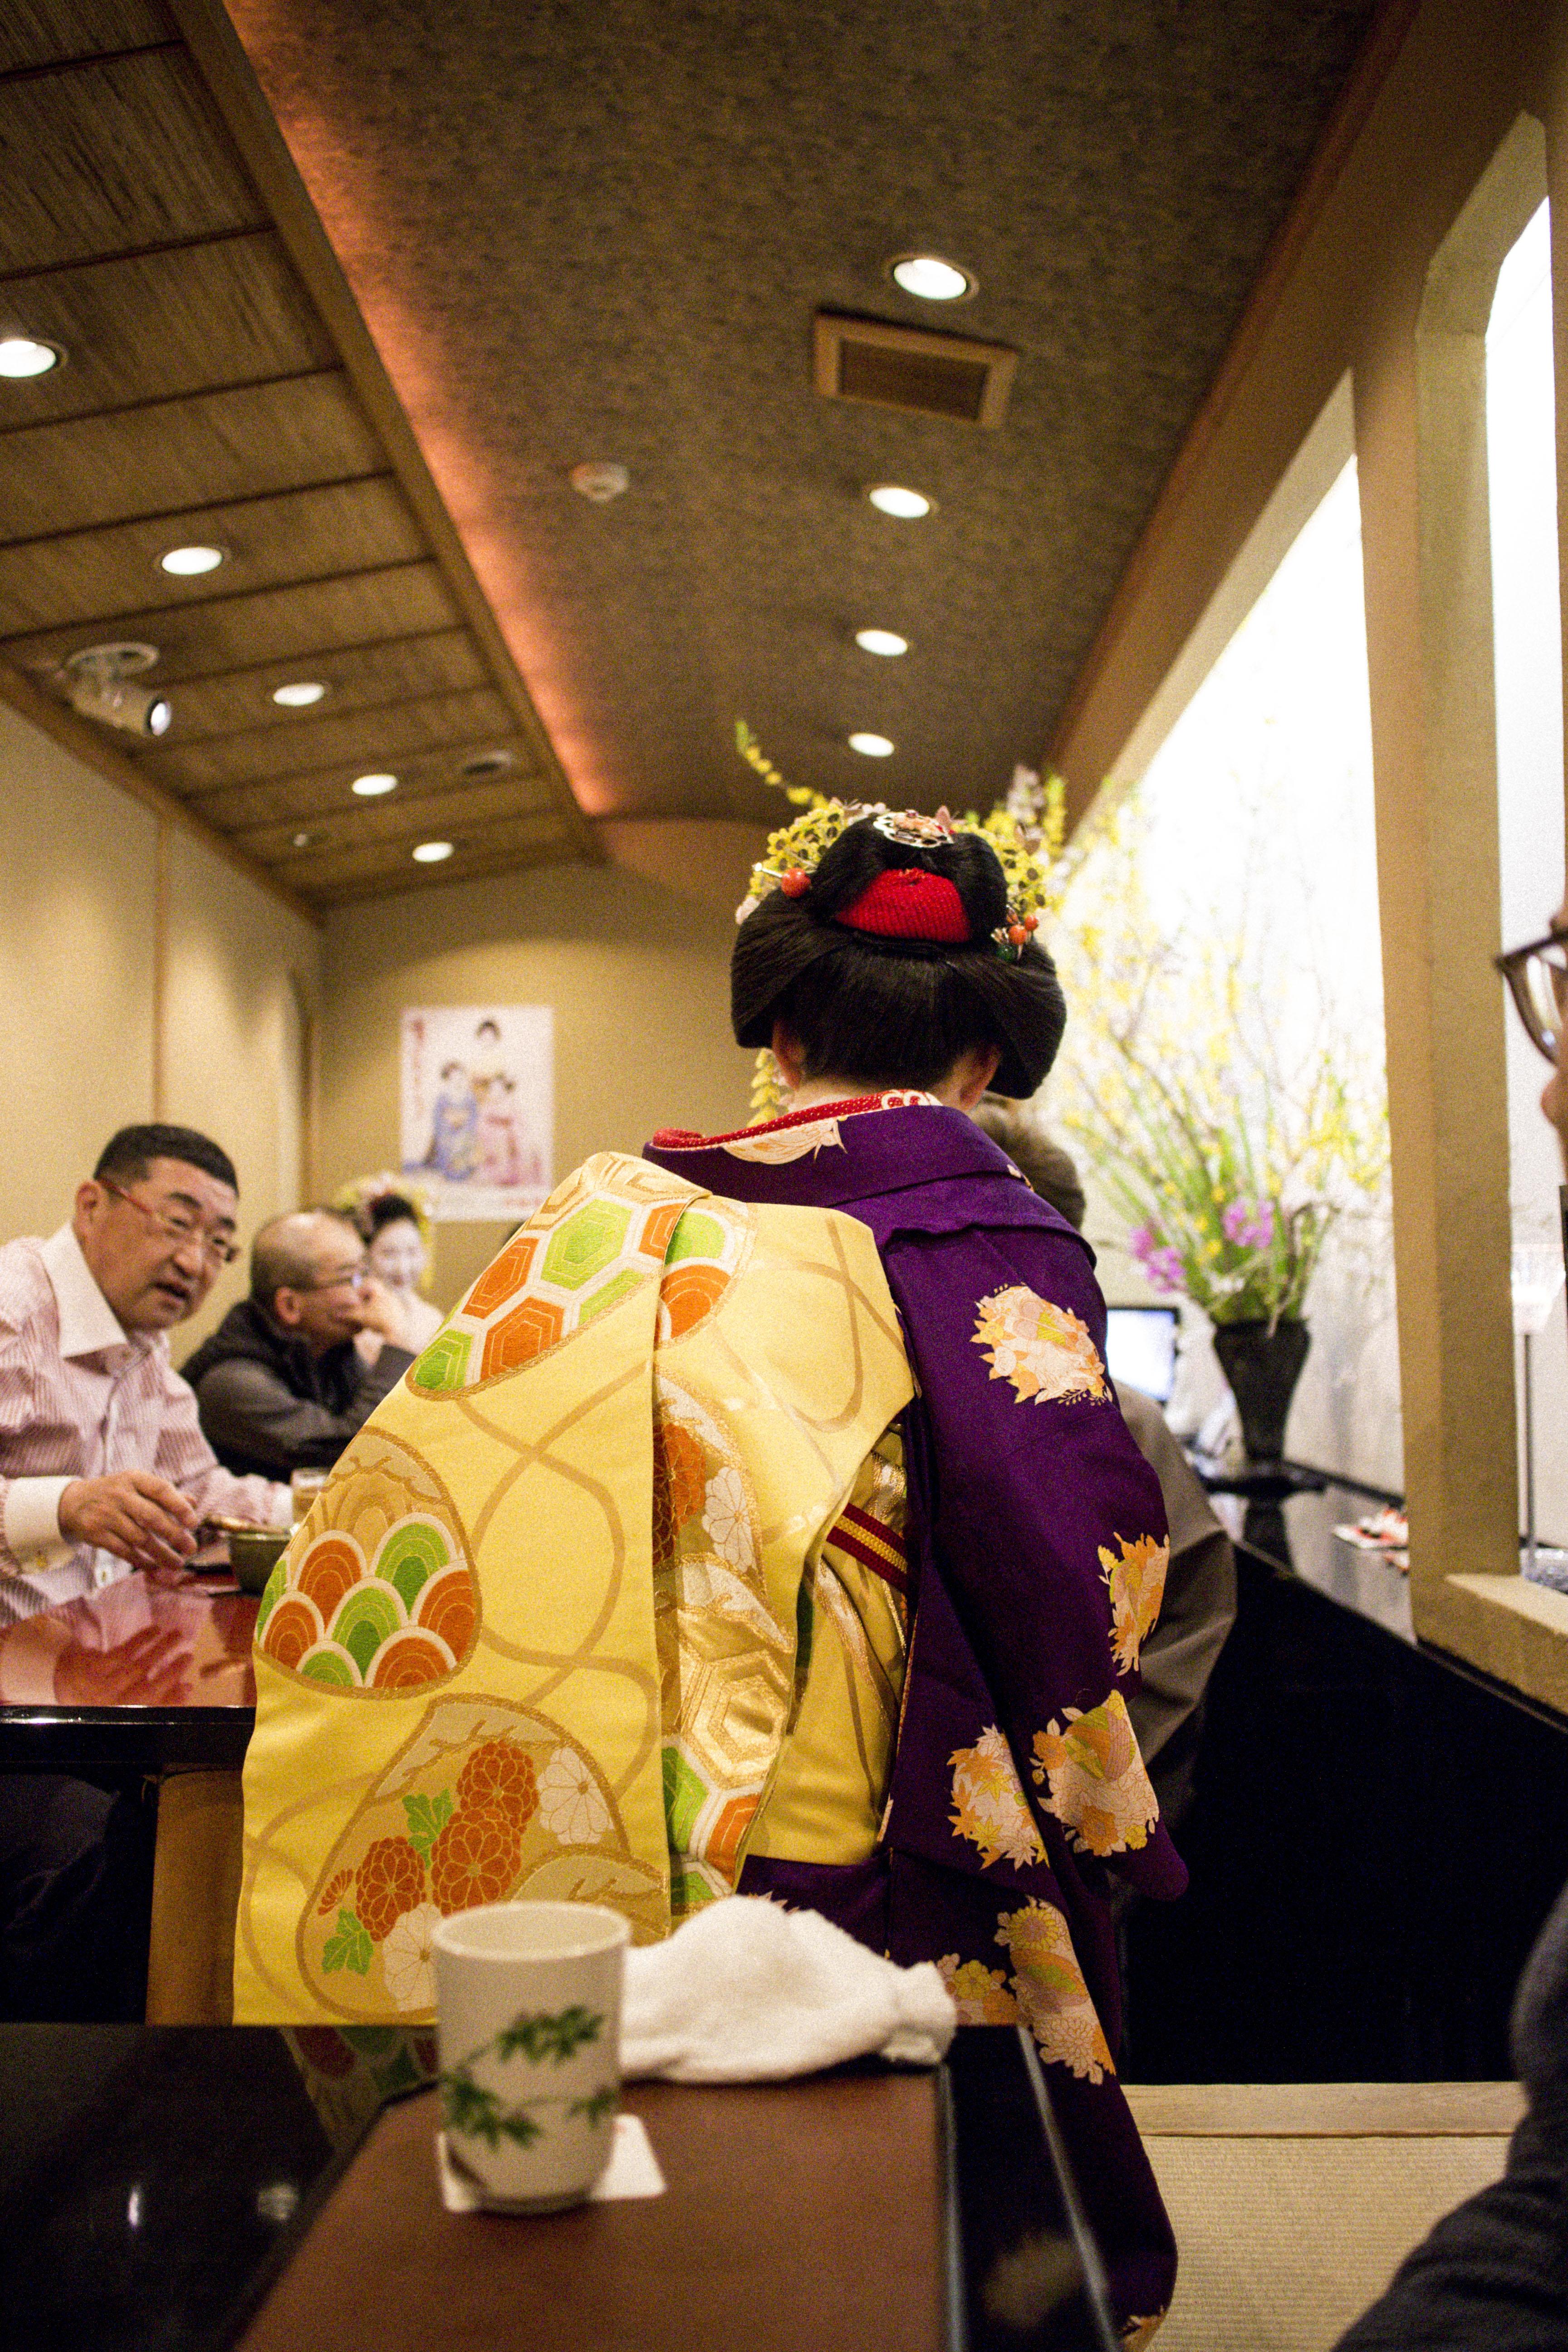 IHEARTALICE_kyoto_geisha_teahouse_05